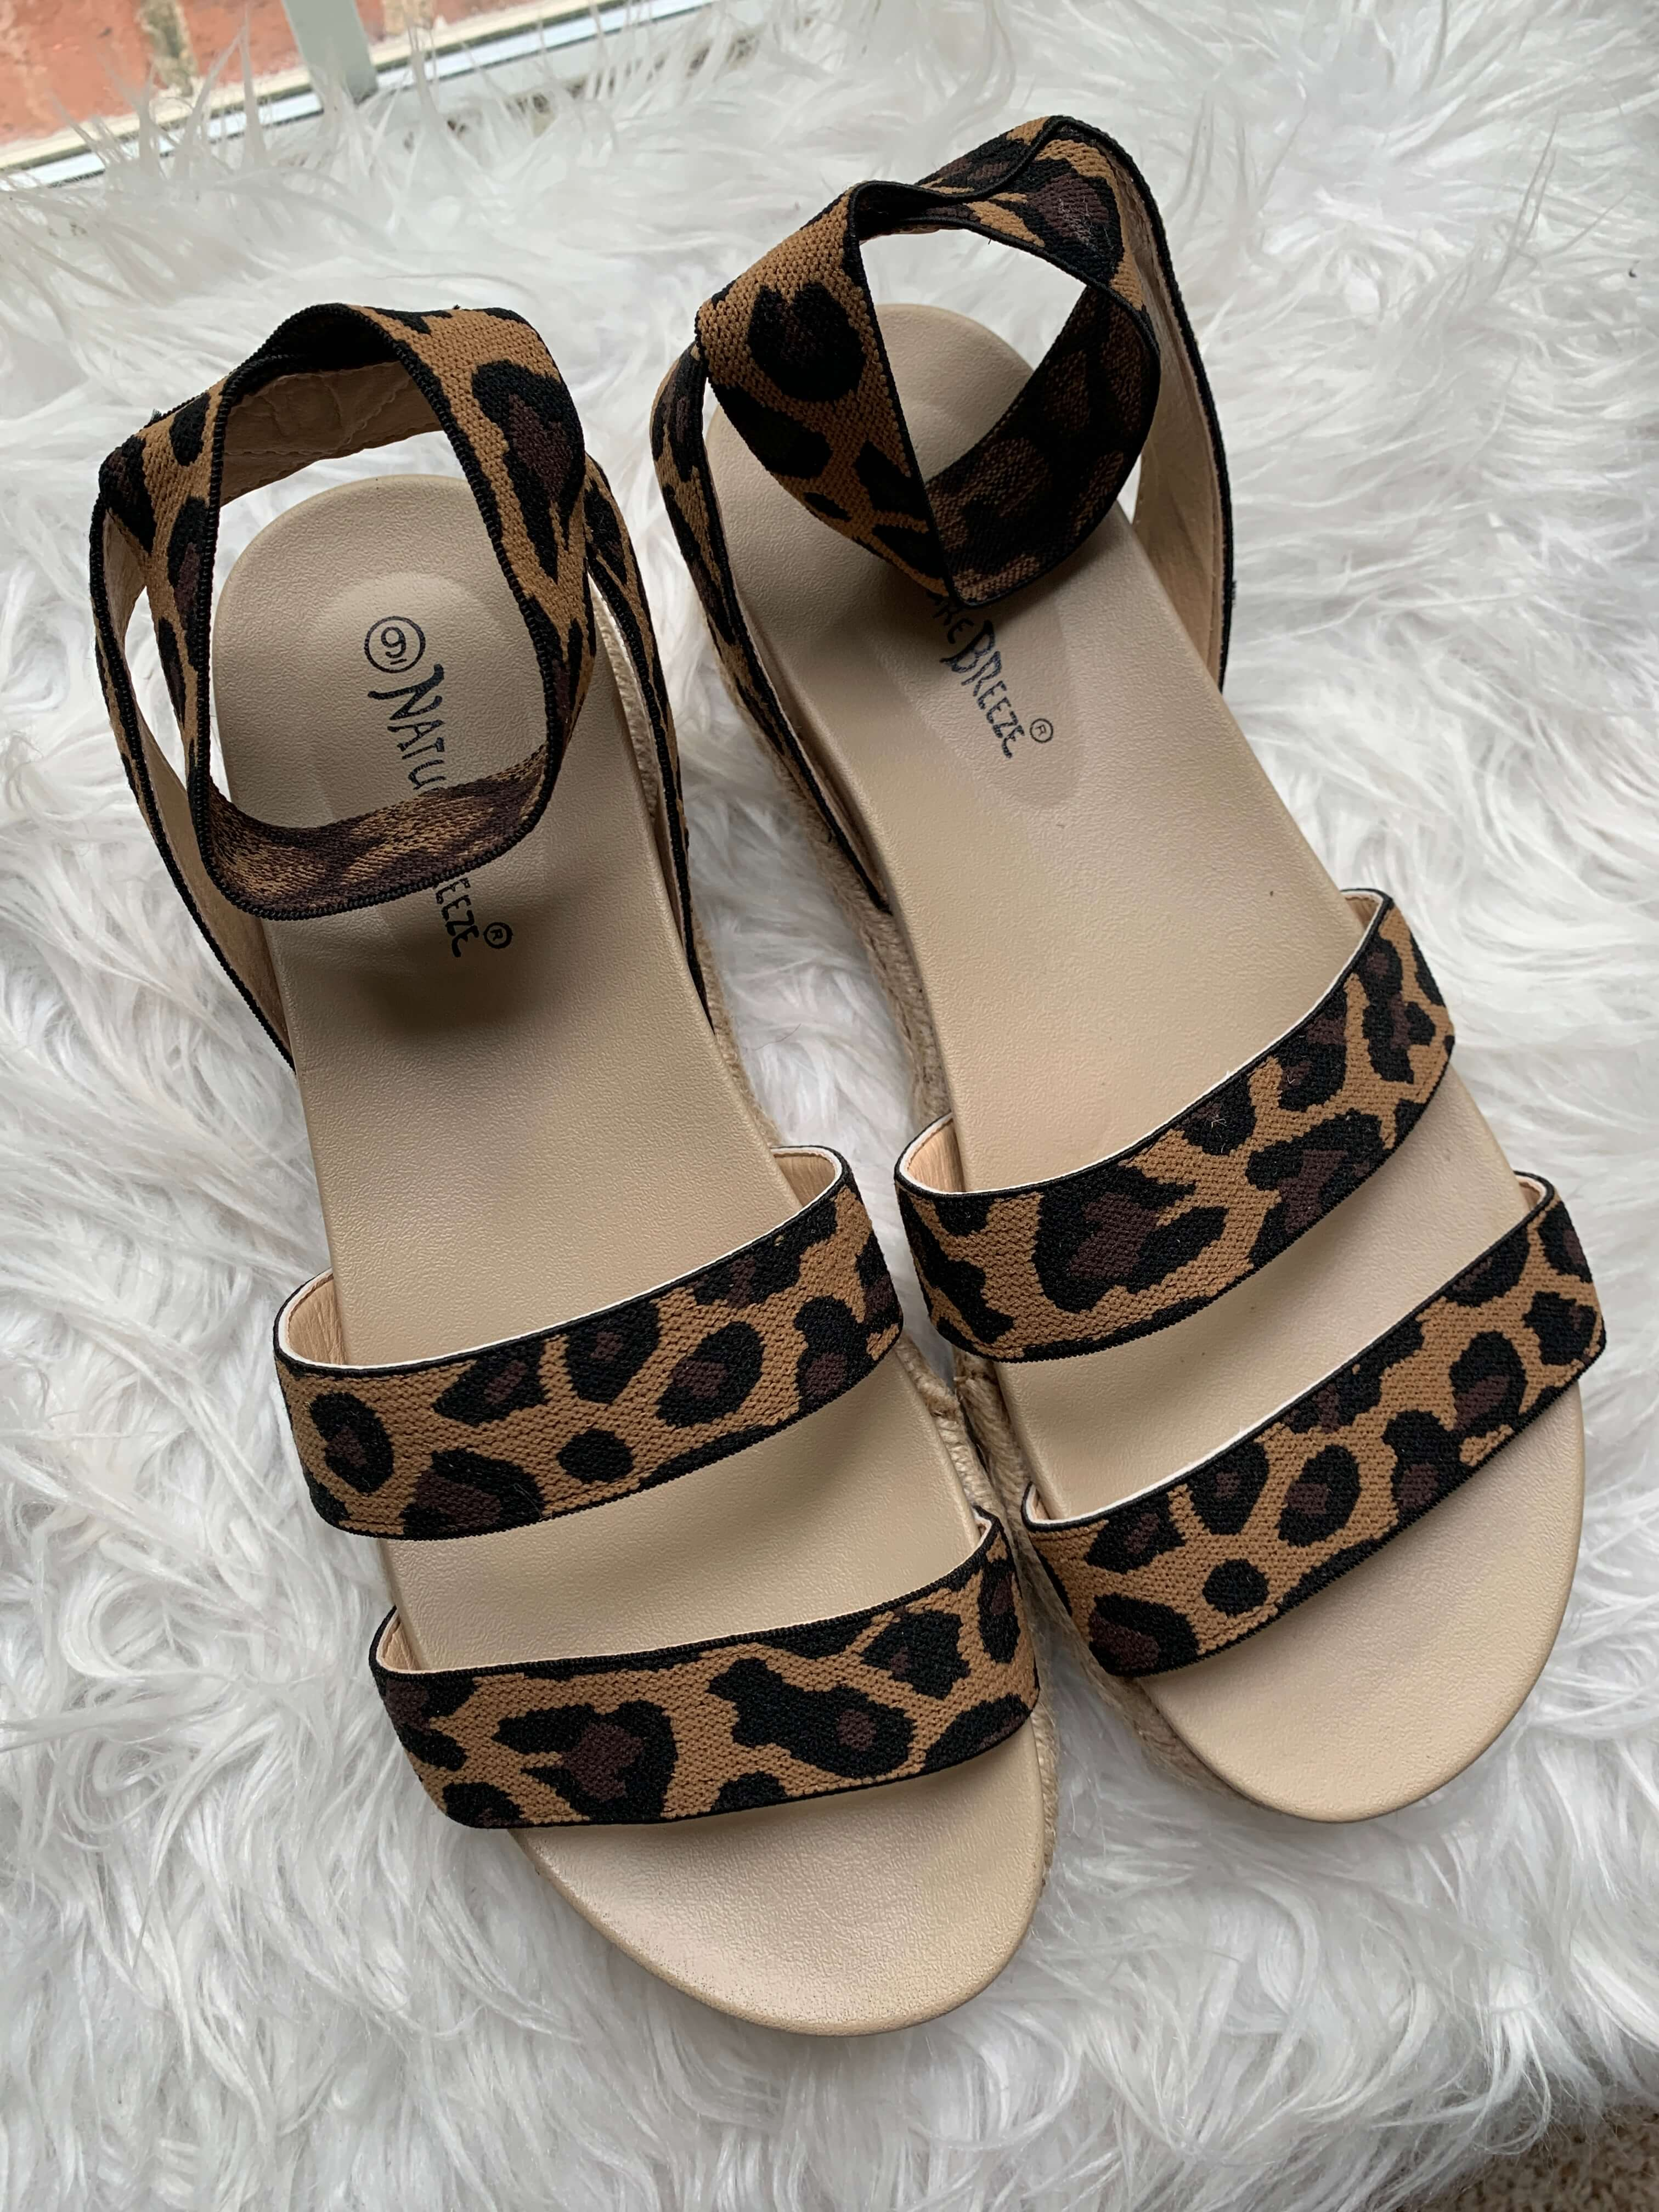 Amazon Fashion Haul | leopard espadrille flatform | Style Your Senses